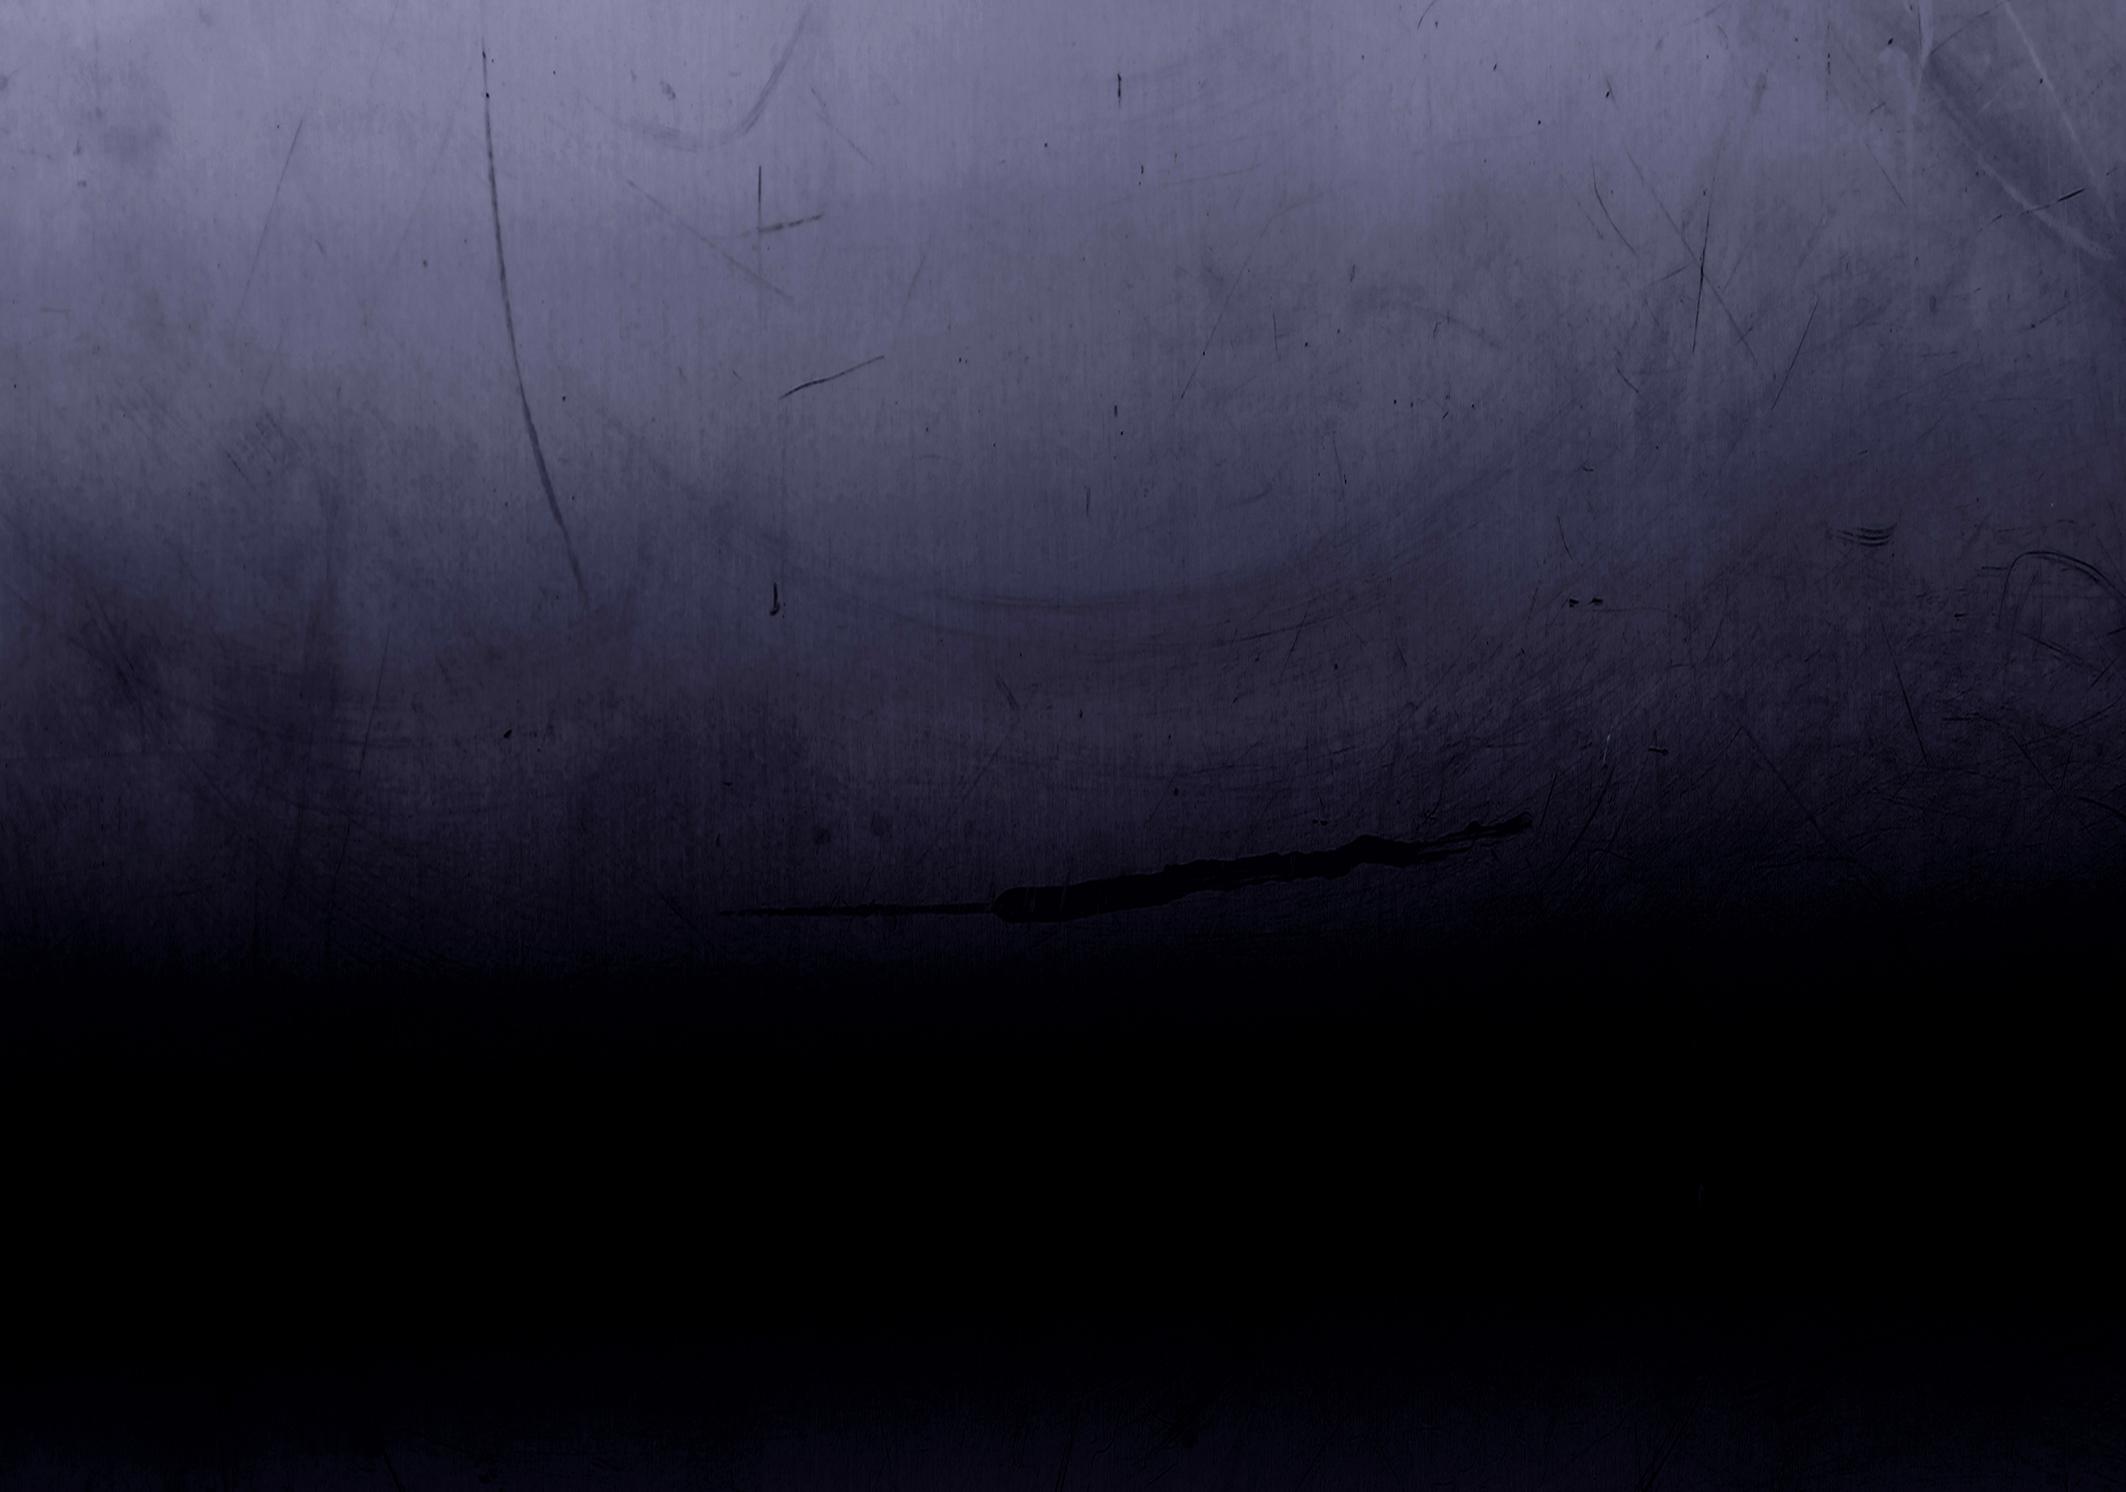 'Inversion VII', 2011, Giclee print on Hahnemuhle photo rag 308gsm, 183 x 122 cm